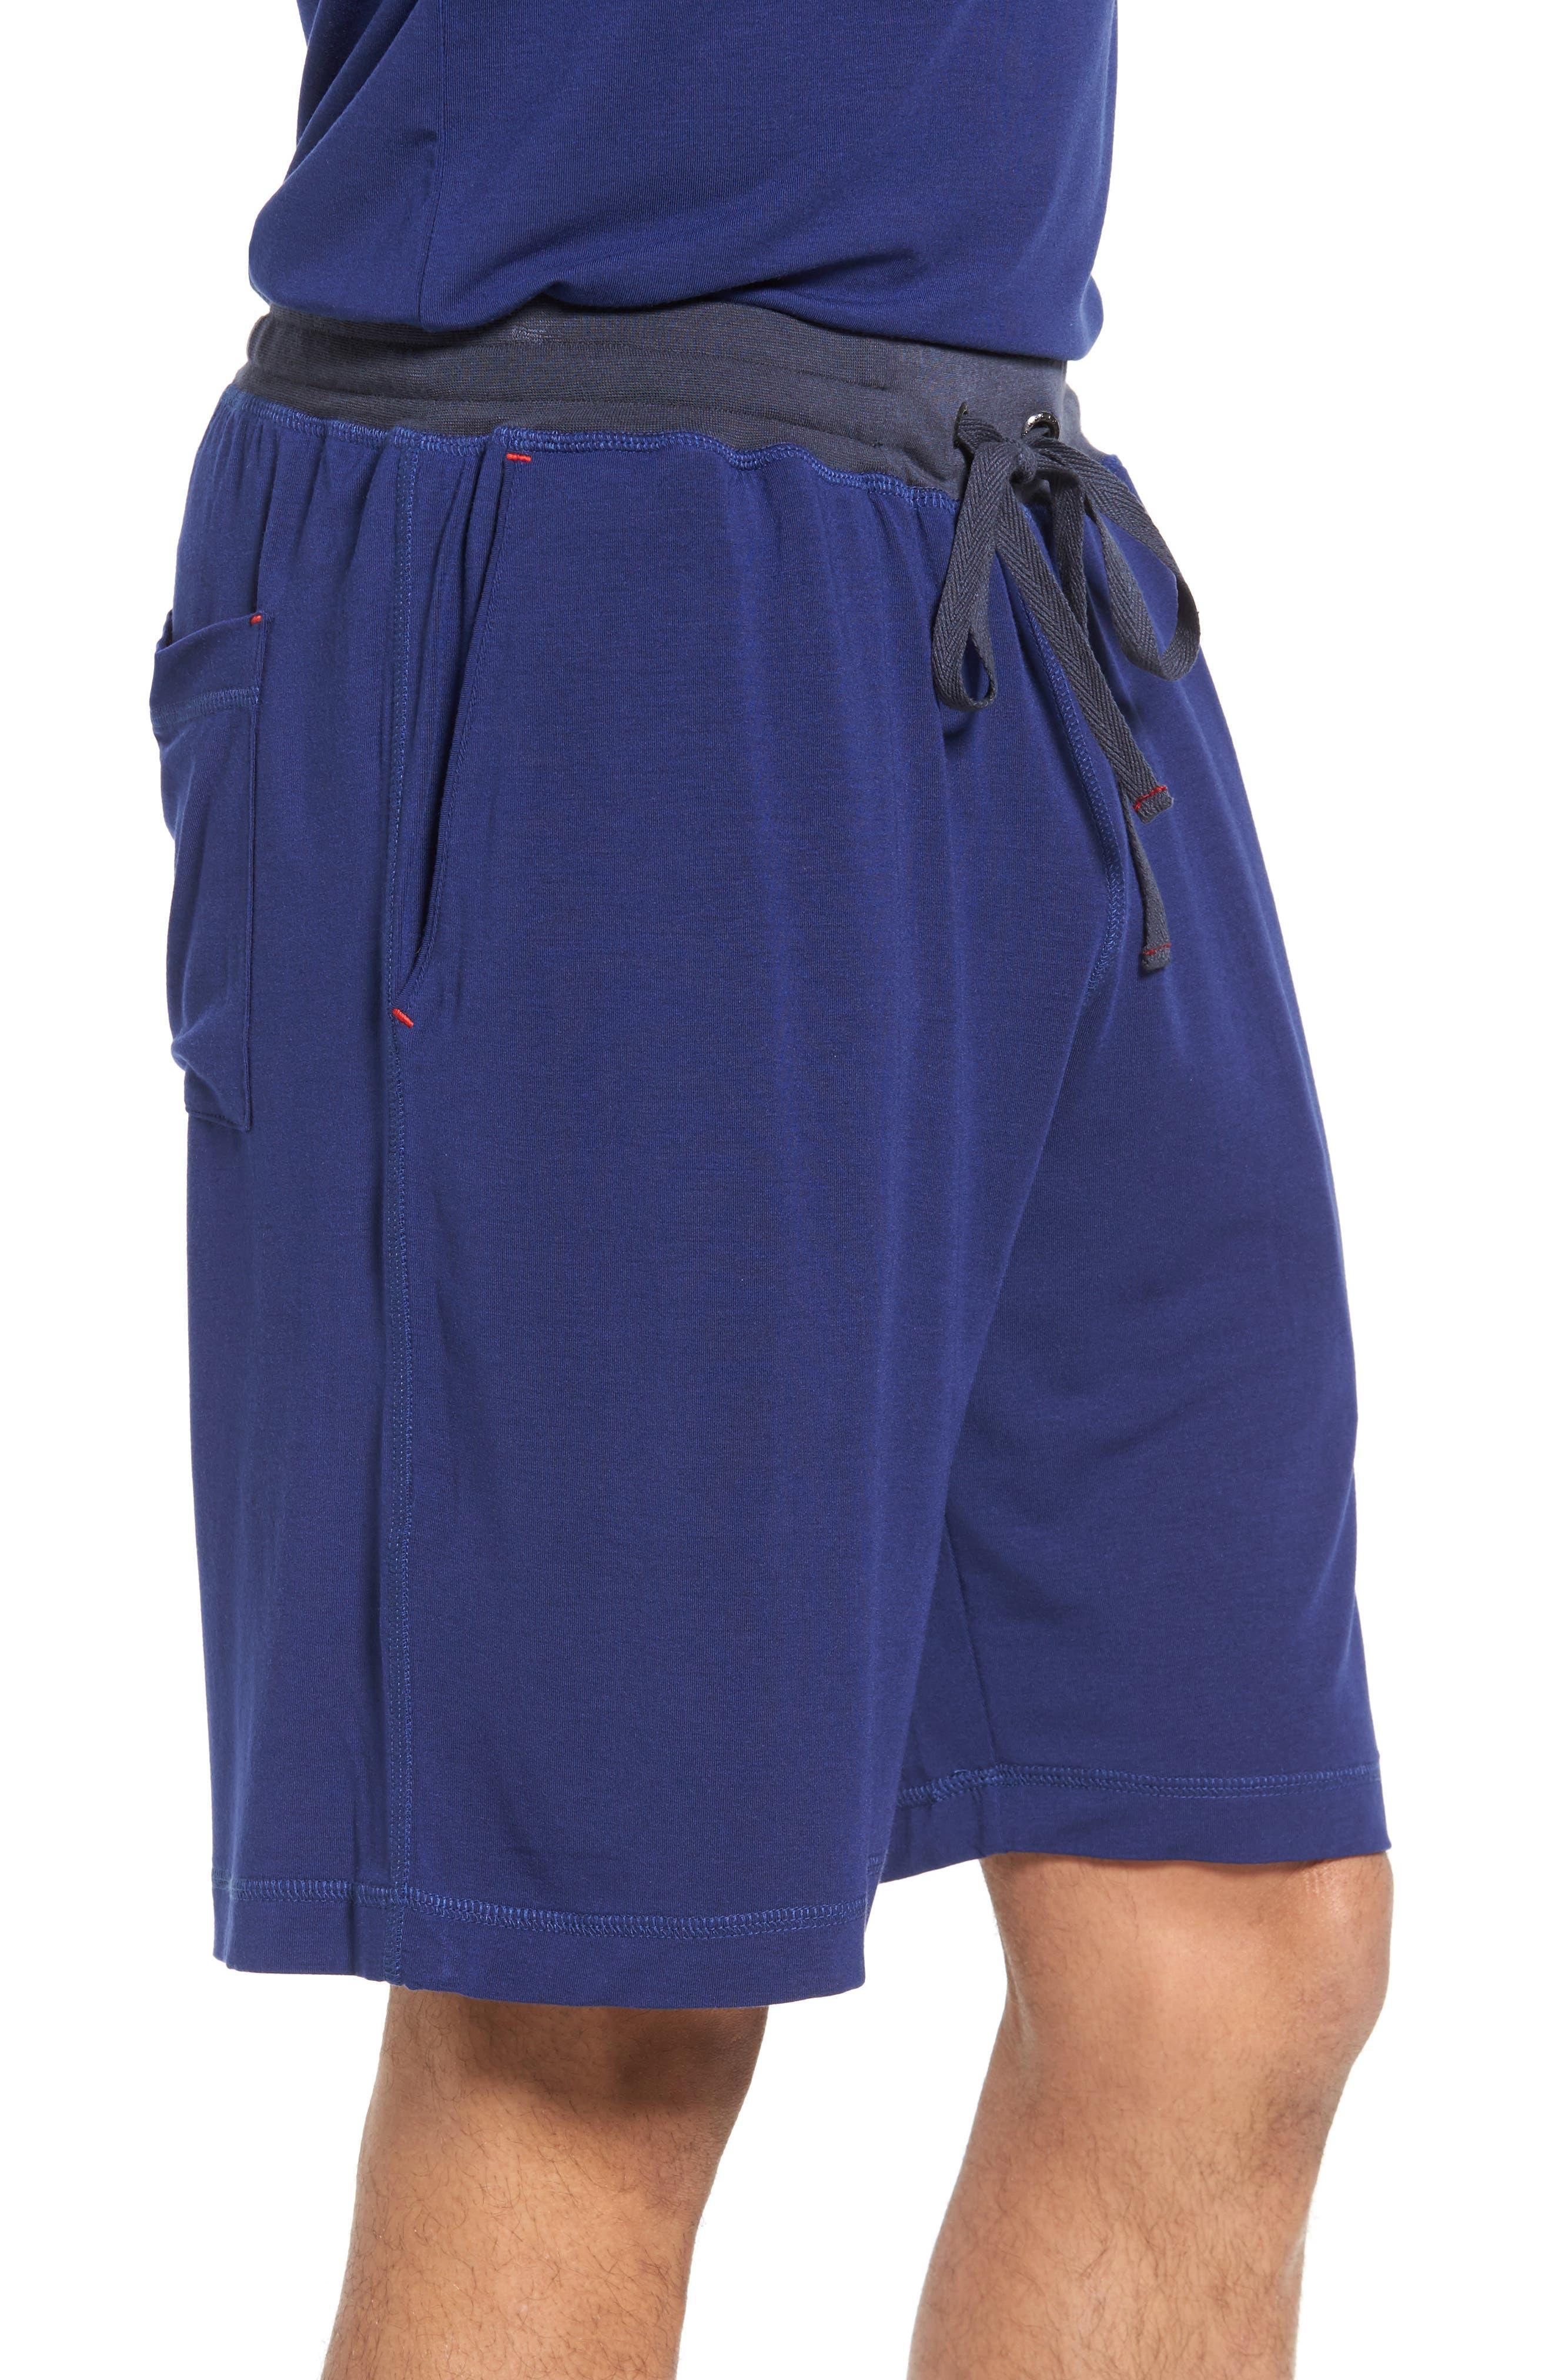 Lounge Shorts,                             Alternate thumbnail 3, color,                             413